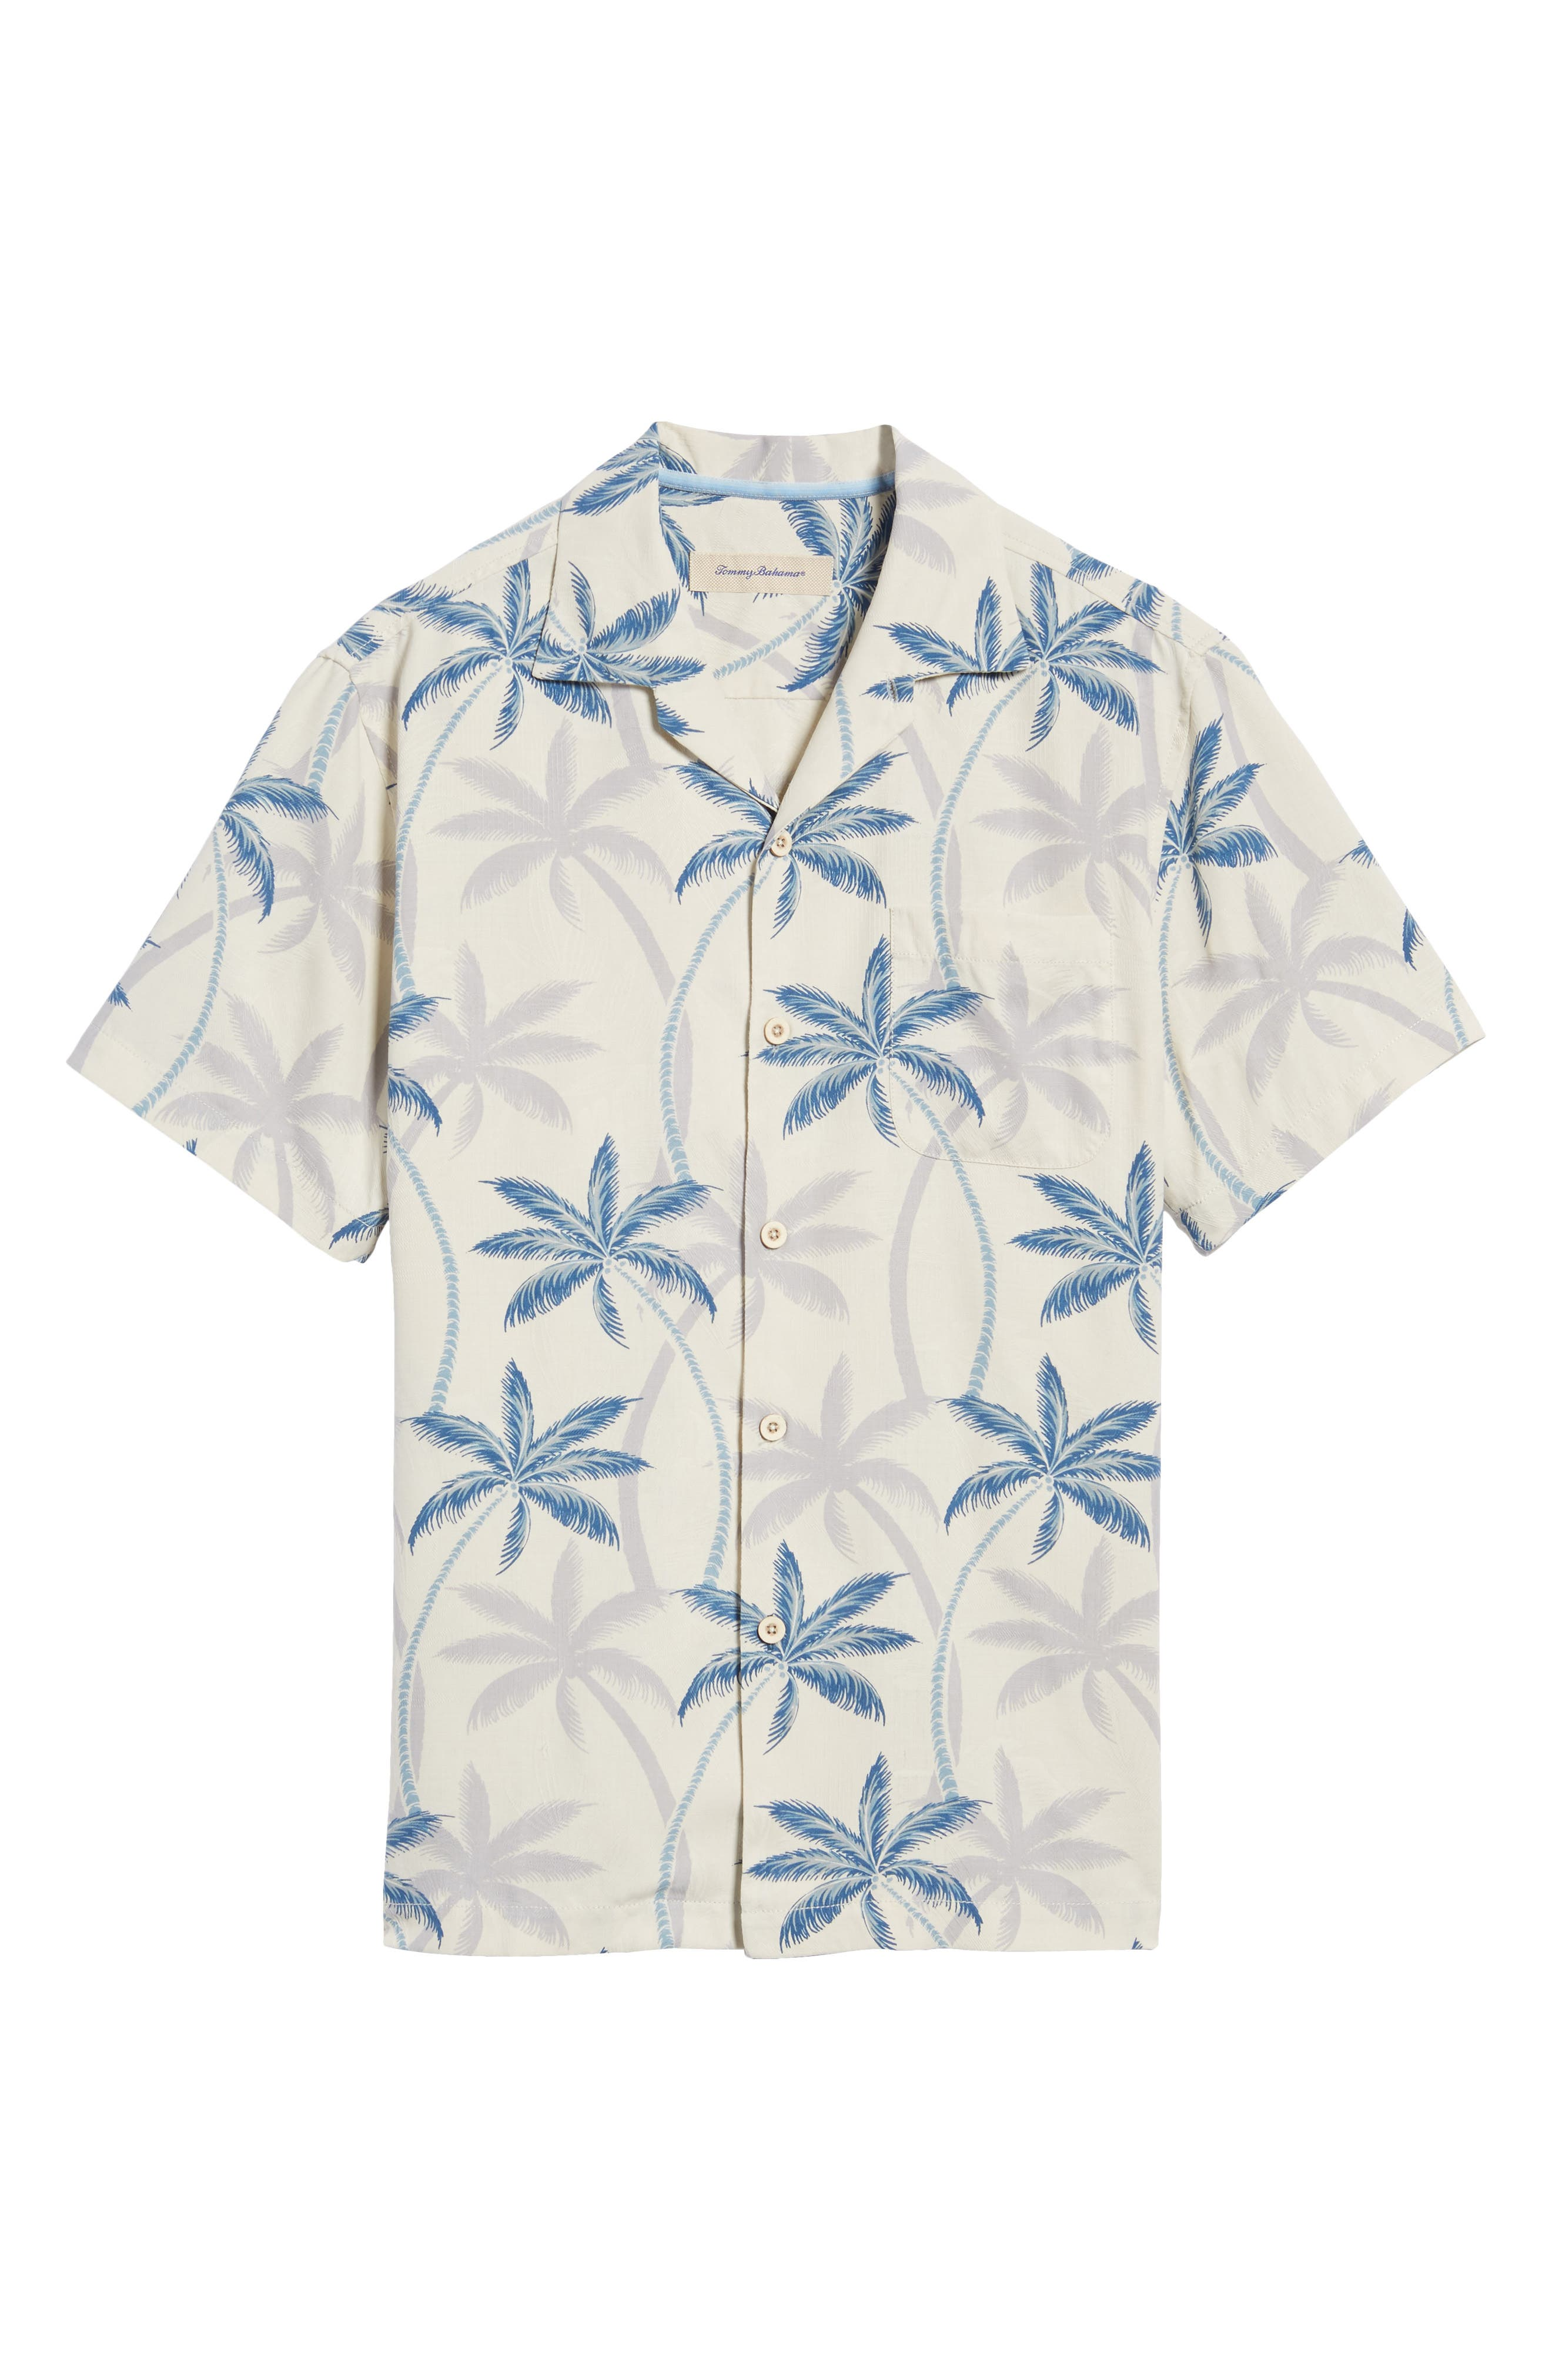 Palmas Palooza Woven Shirt,                             Alternate thumbnail 6, color,                             Continental